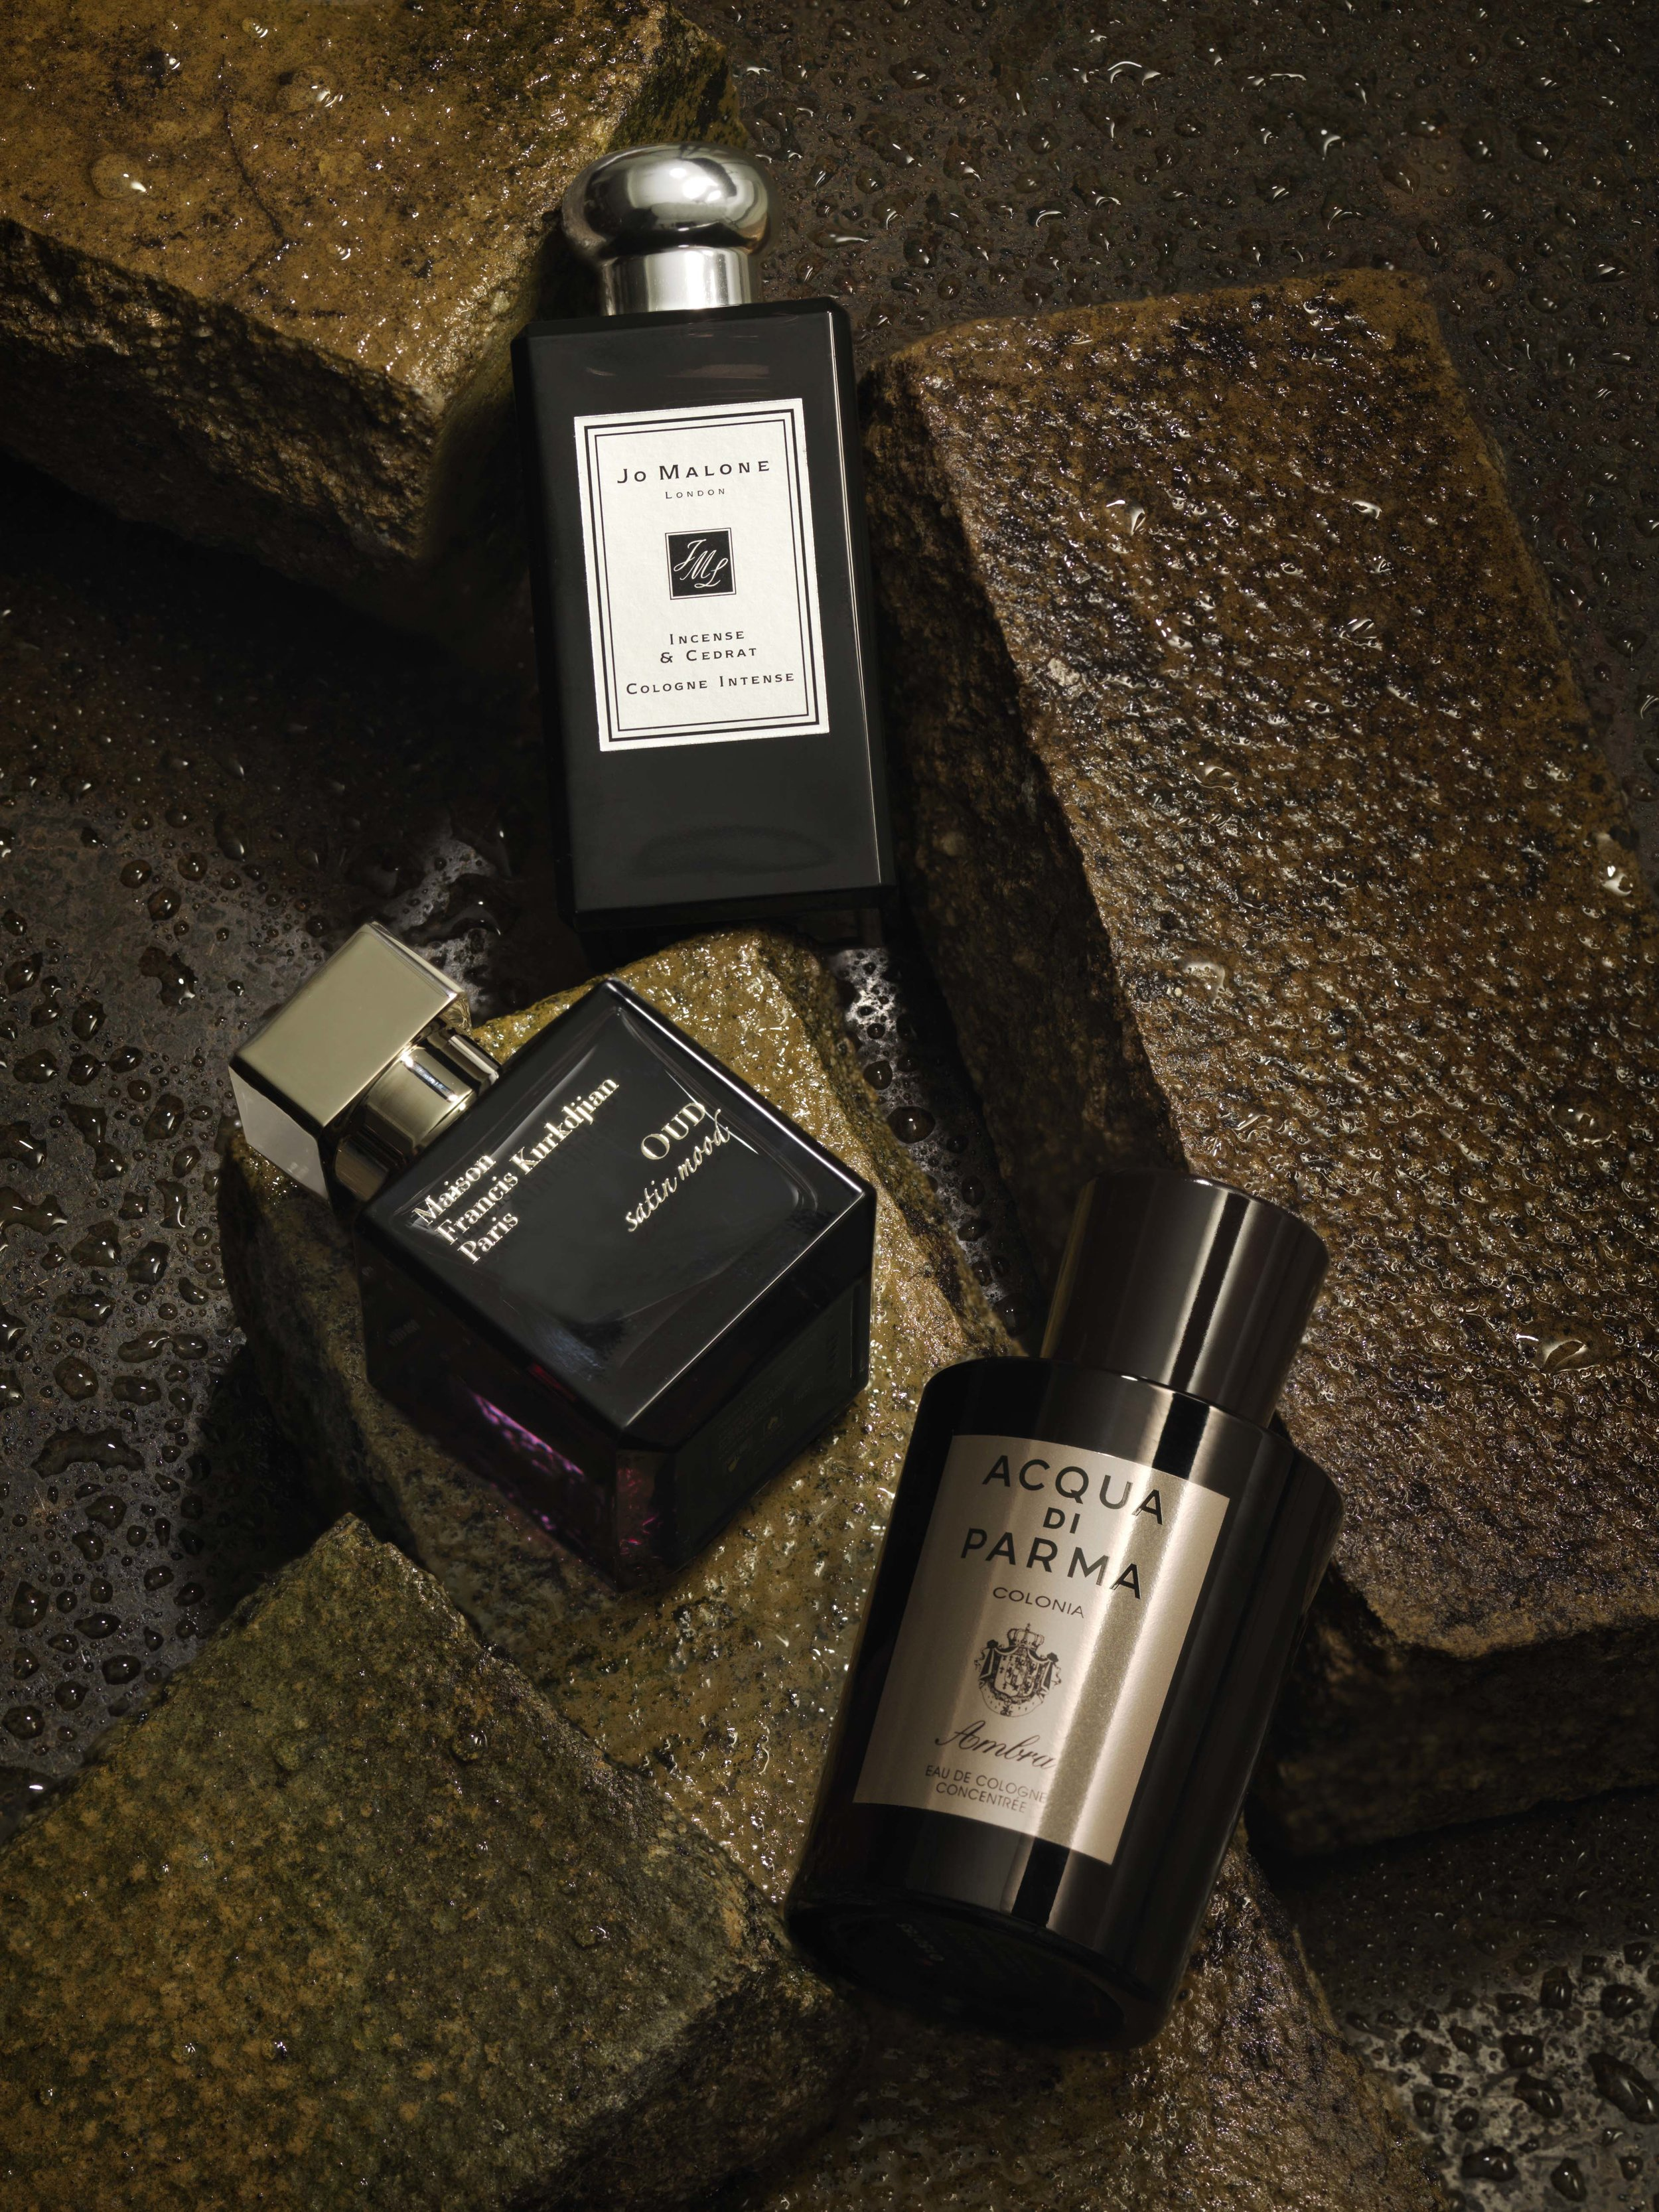 DH&Co-Photography-Still-Life-GJ Autumn Perfume2 MASTER.jpg